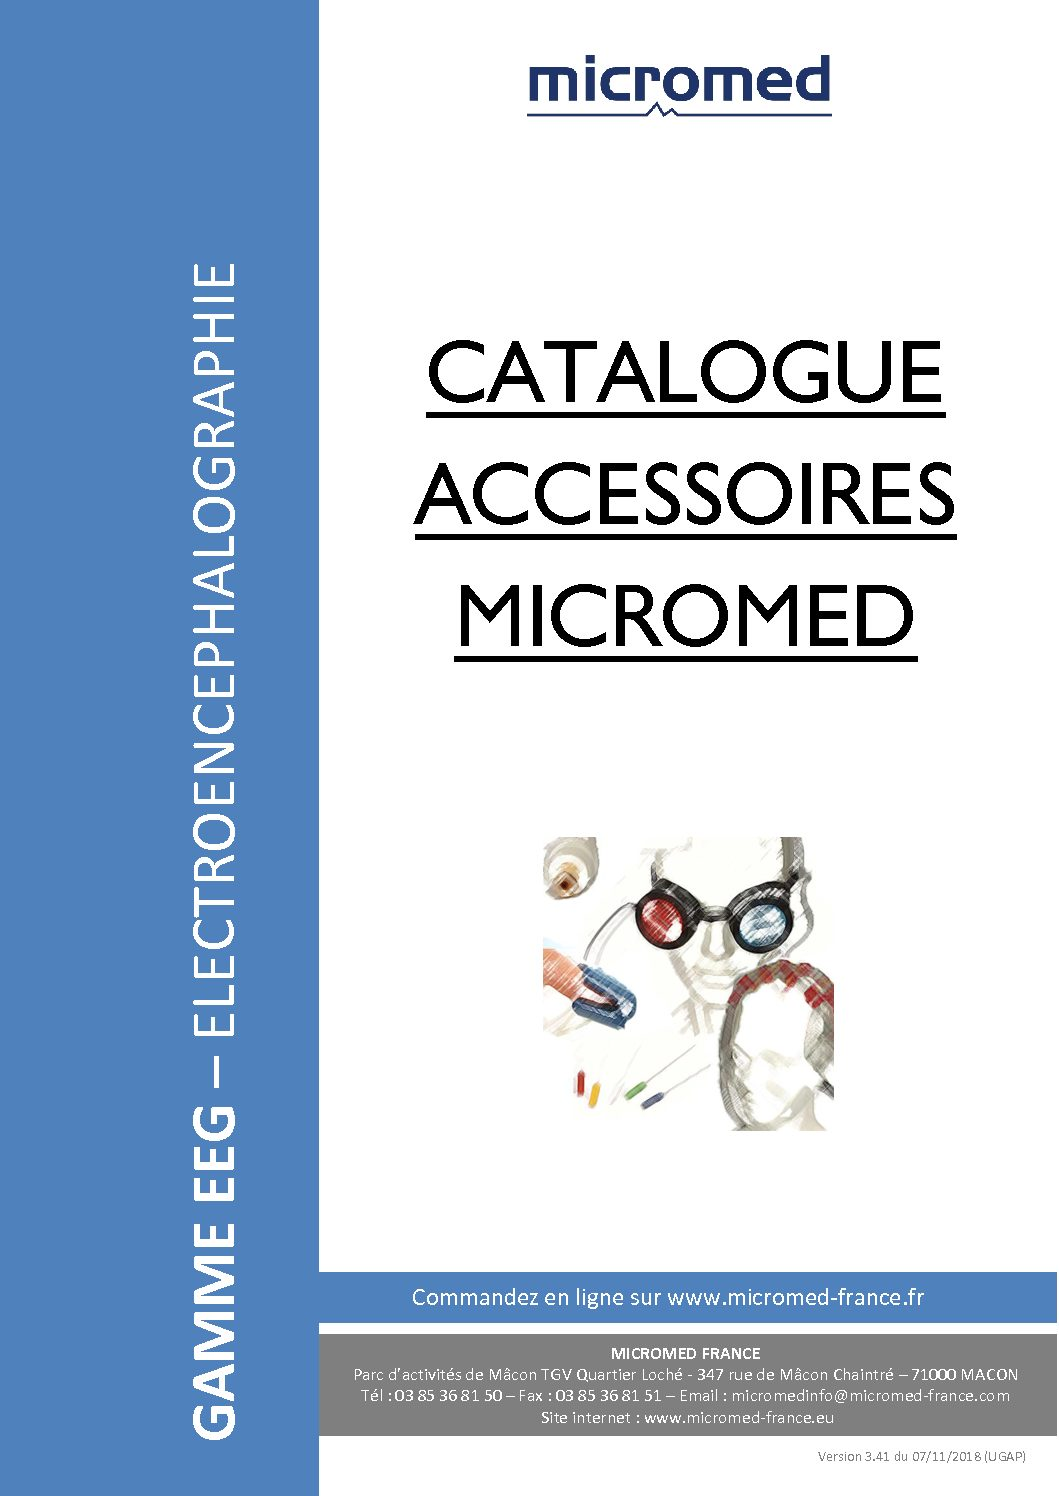 Supports Catalogues Catalogue accessoires EEG 1 pdf - Accessoires